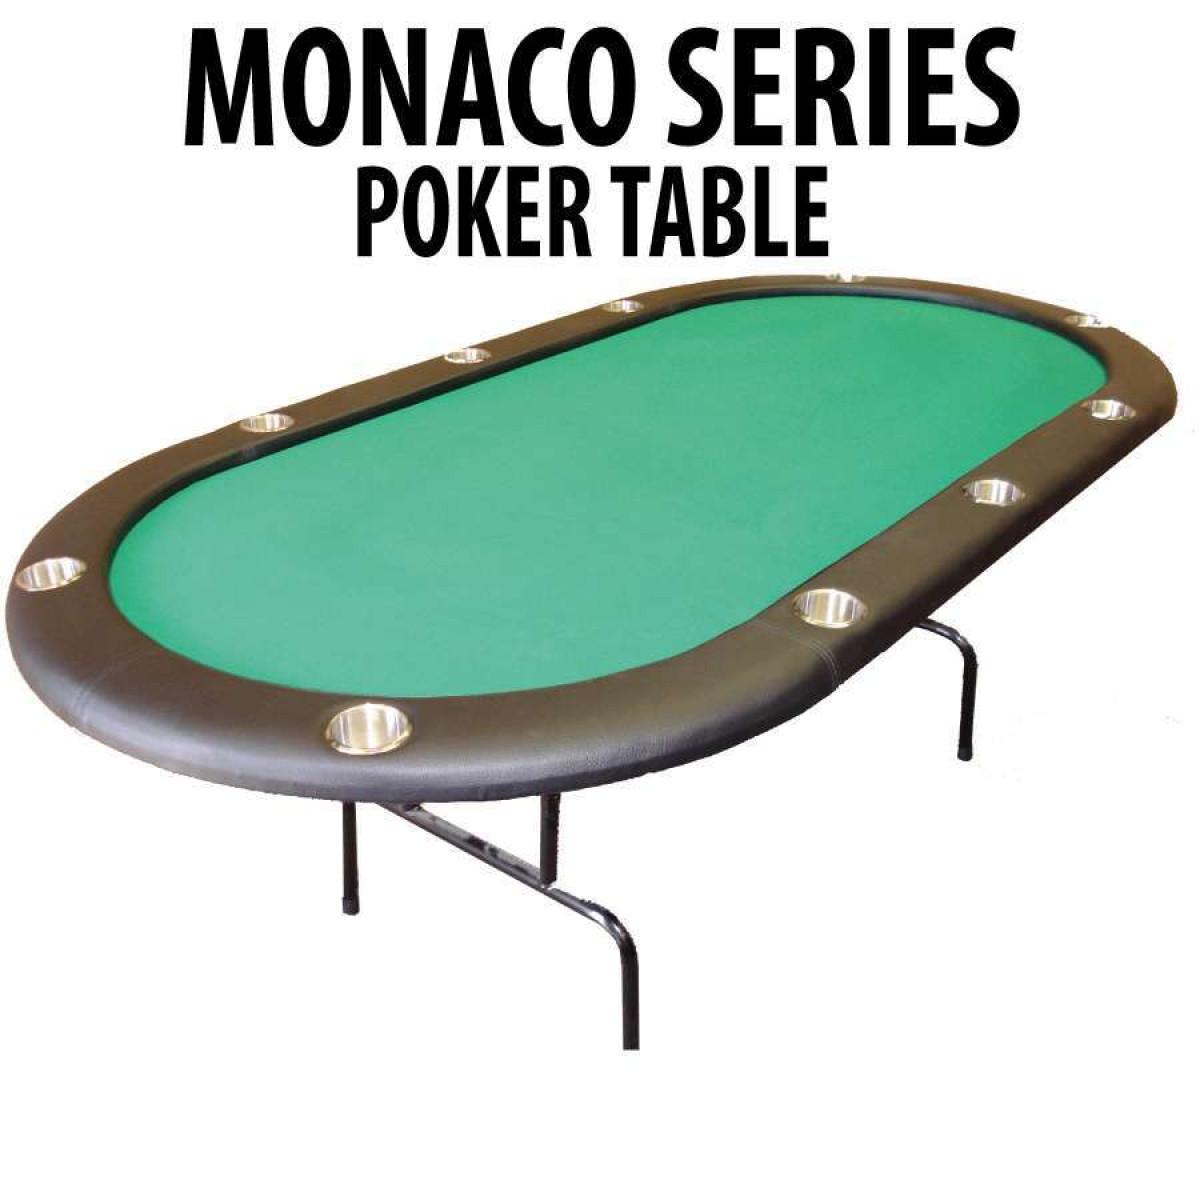 Green poker table